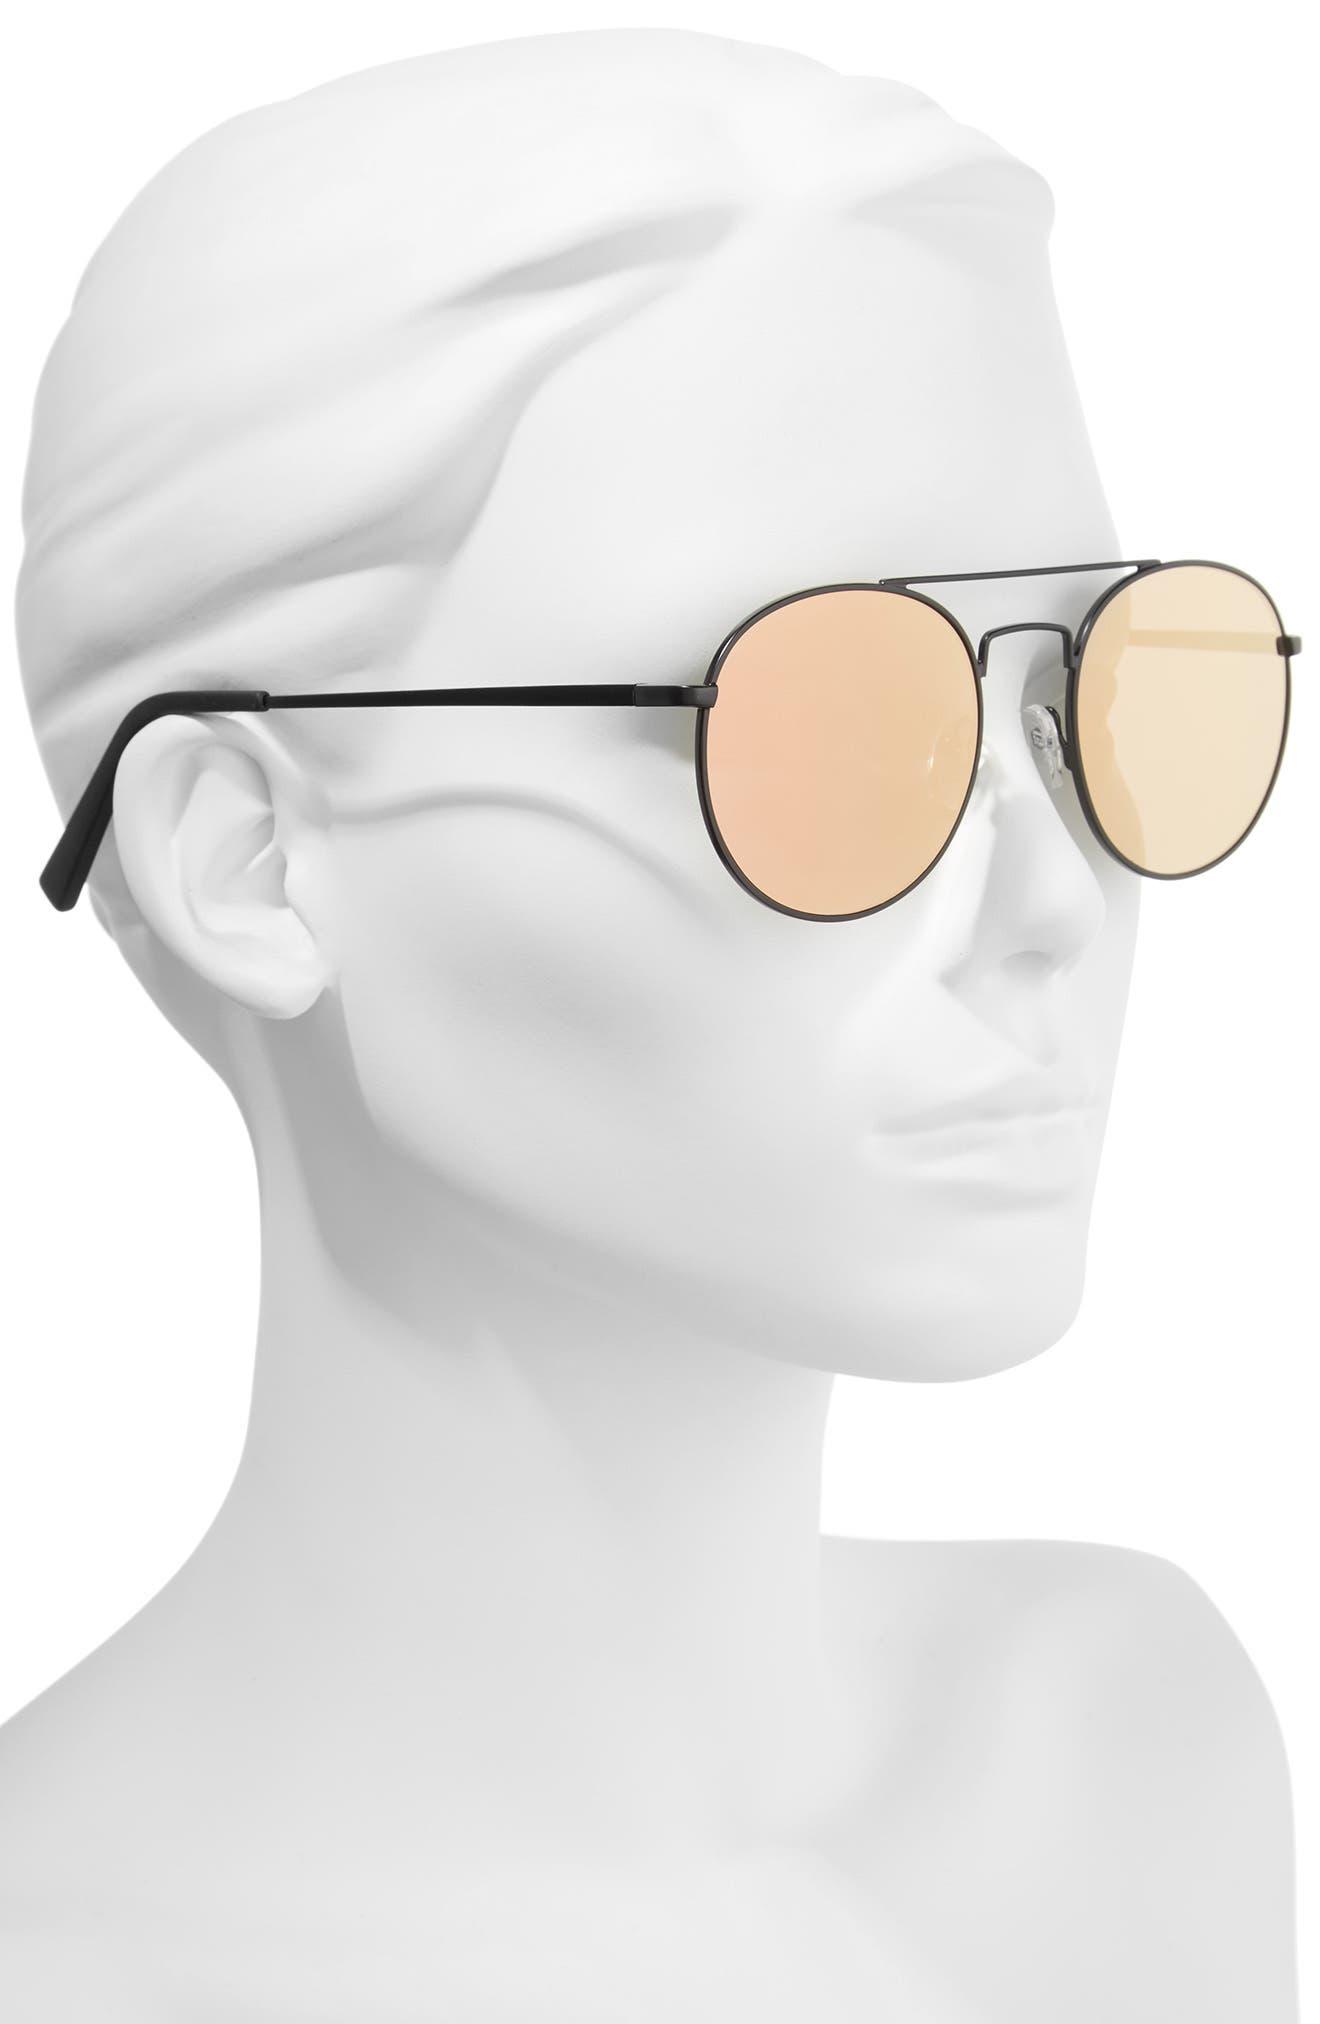 Revolution 53mm Aviator Sunglasses,                             Alternate thumbnail 2, color,                             001